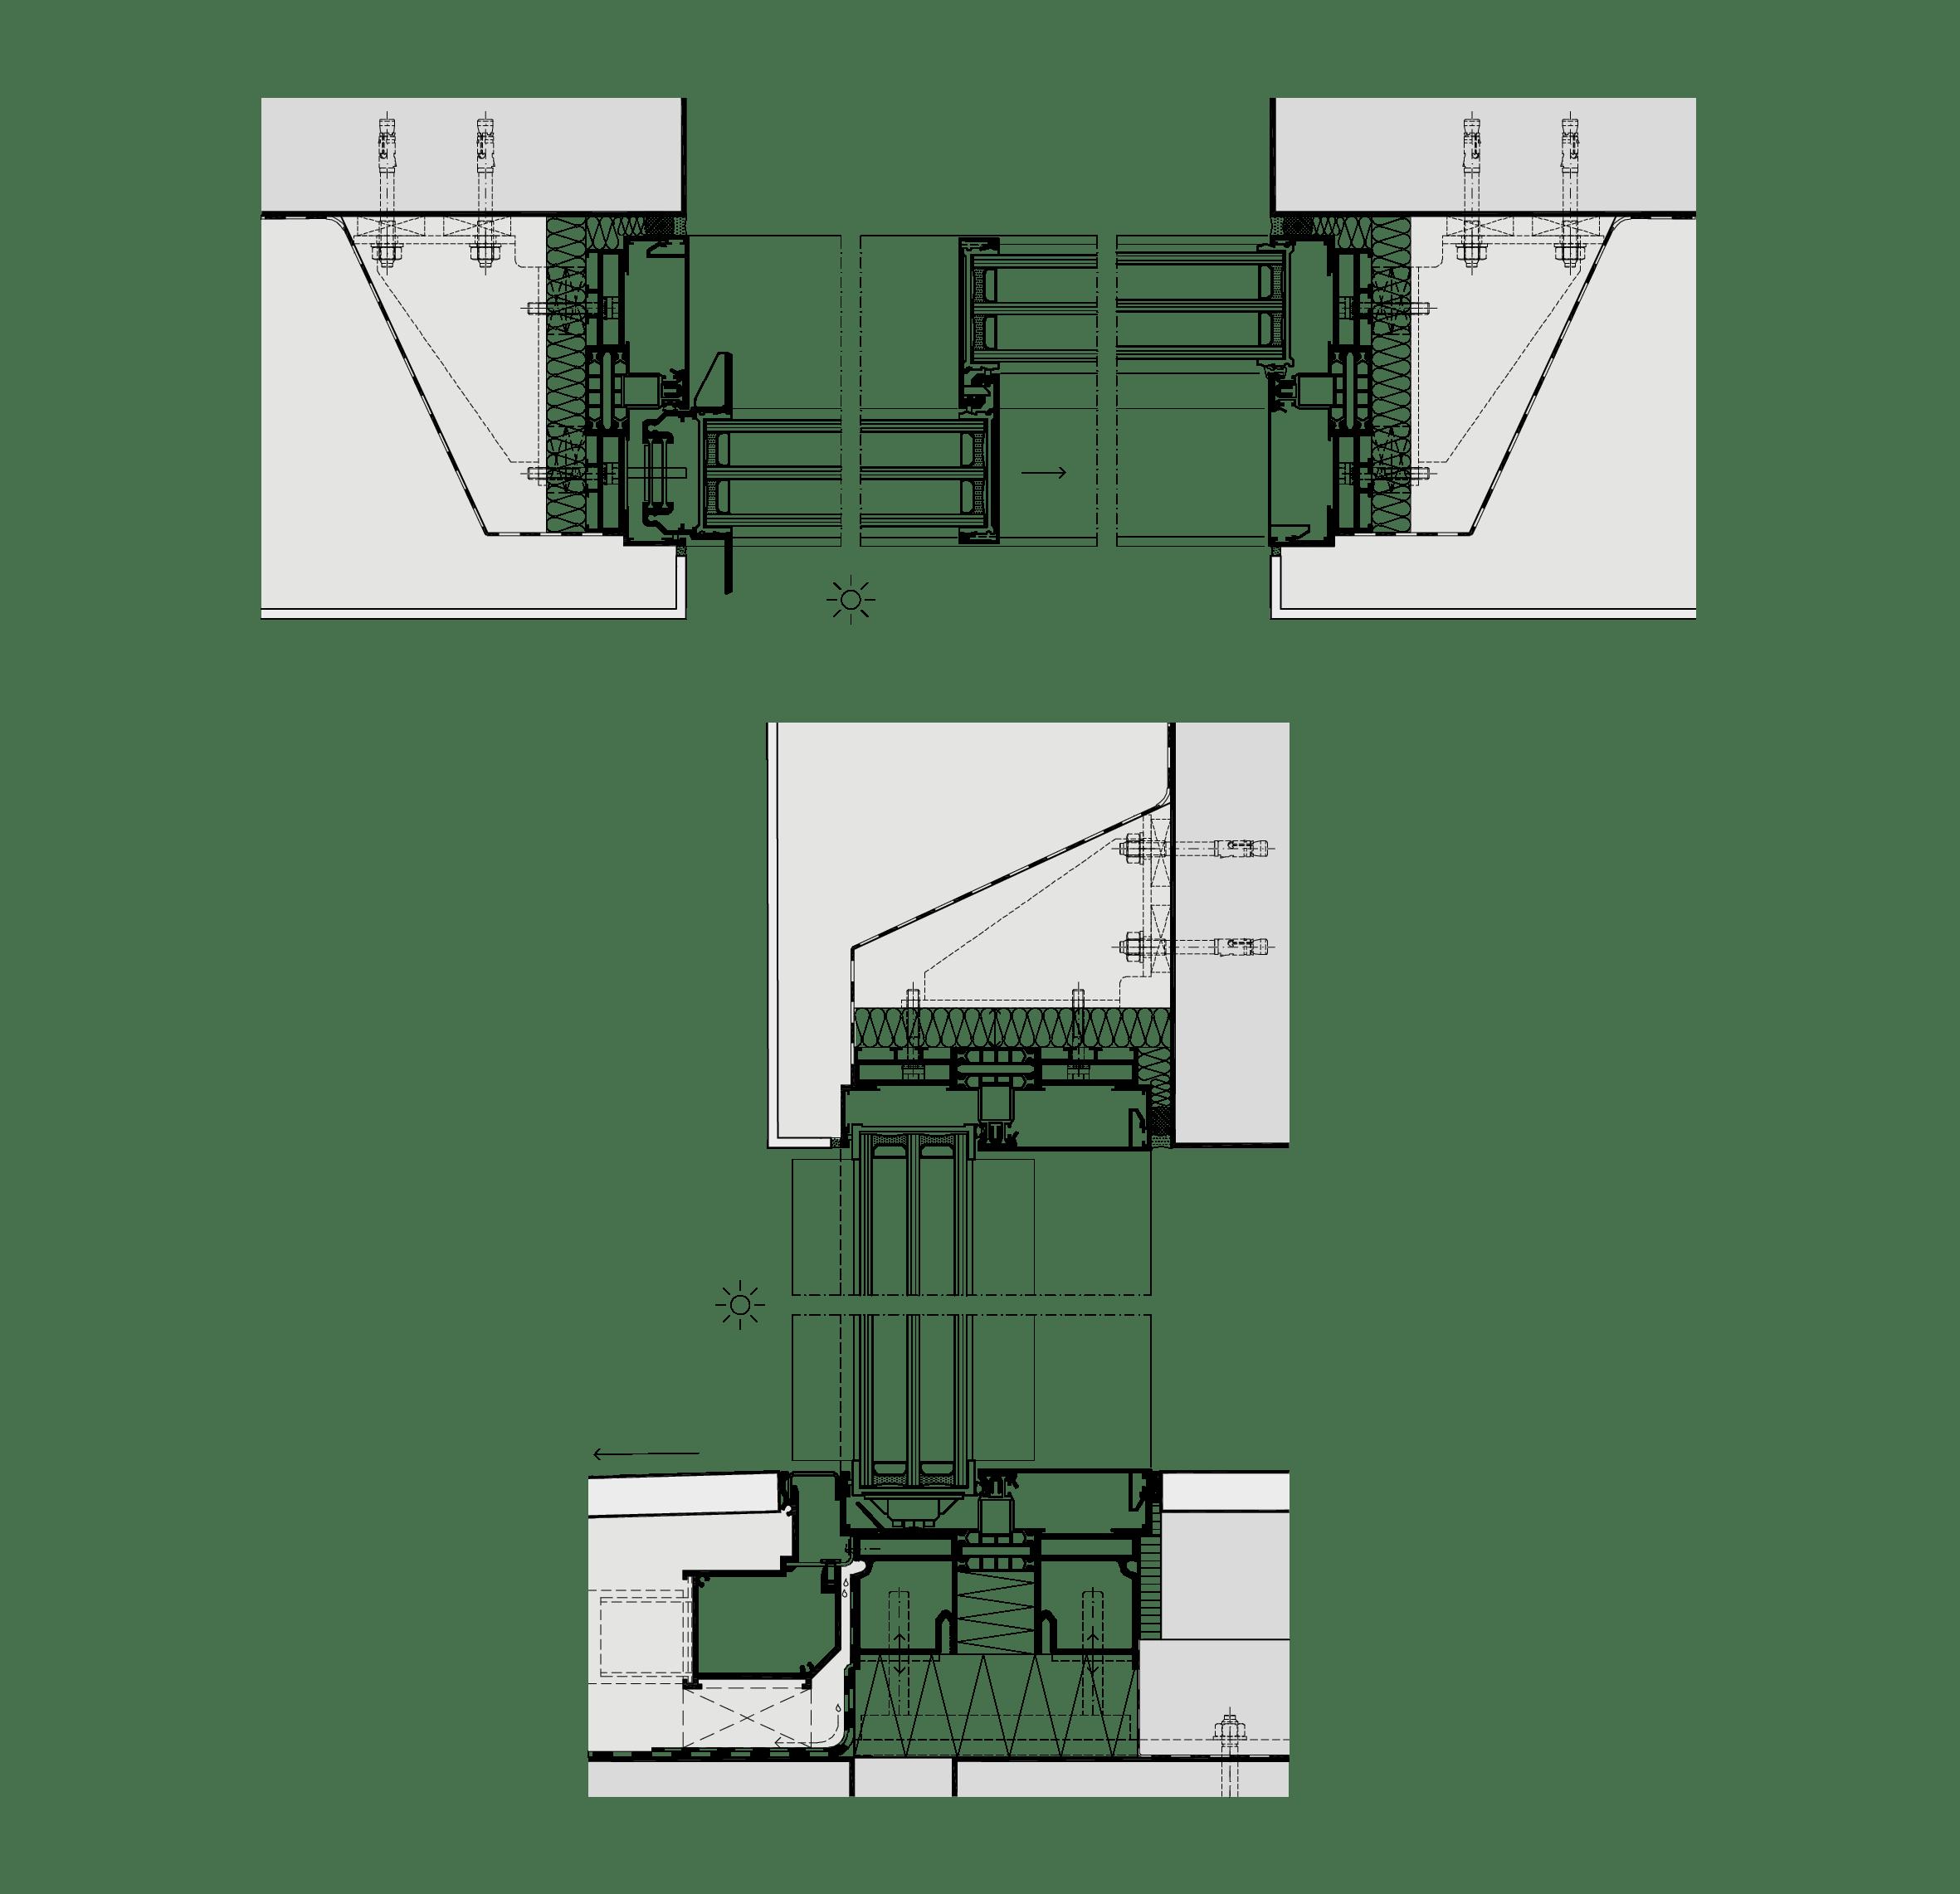 teknologi Technical Drawing Sky Frame 3.png 2362x2283 Q90 Subsampling 2